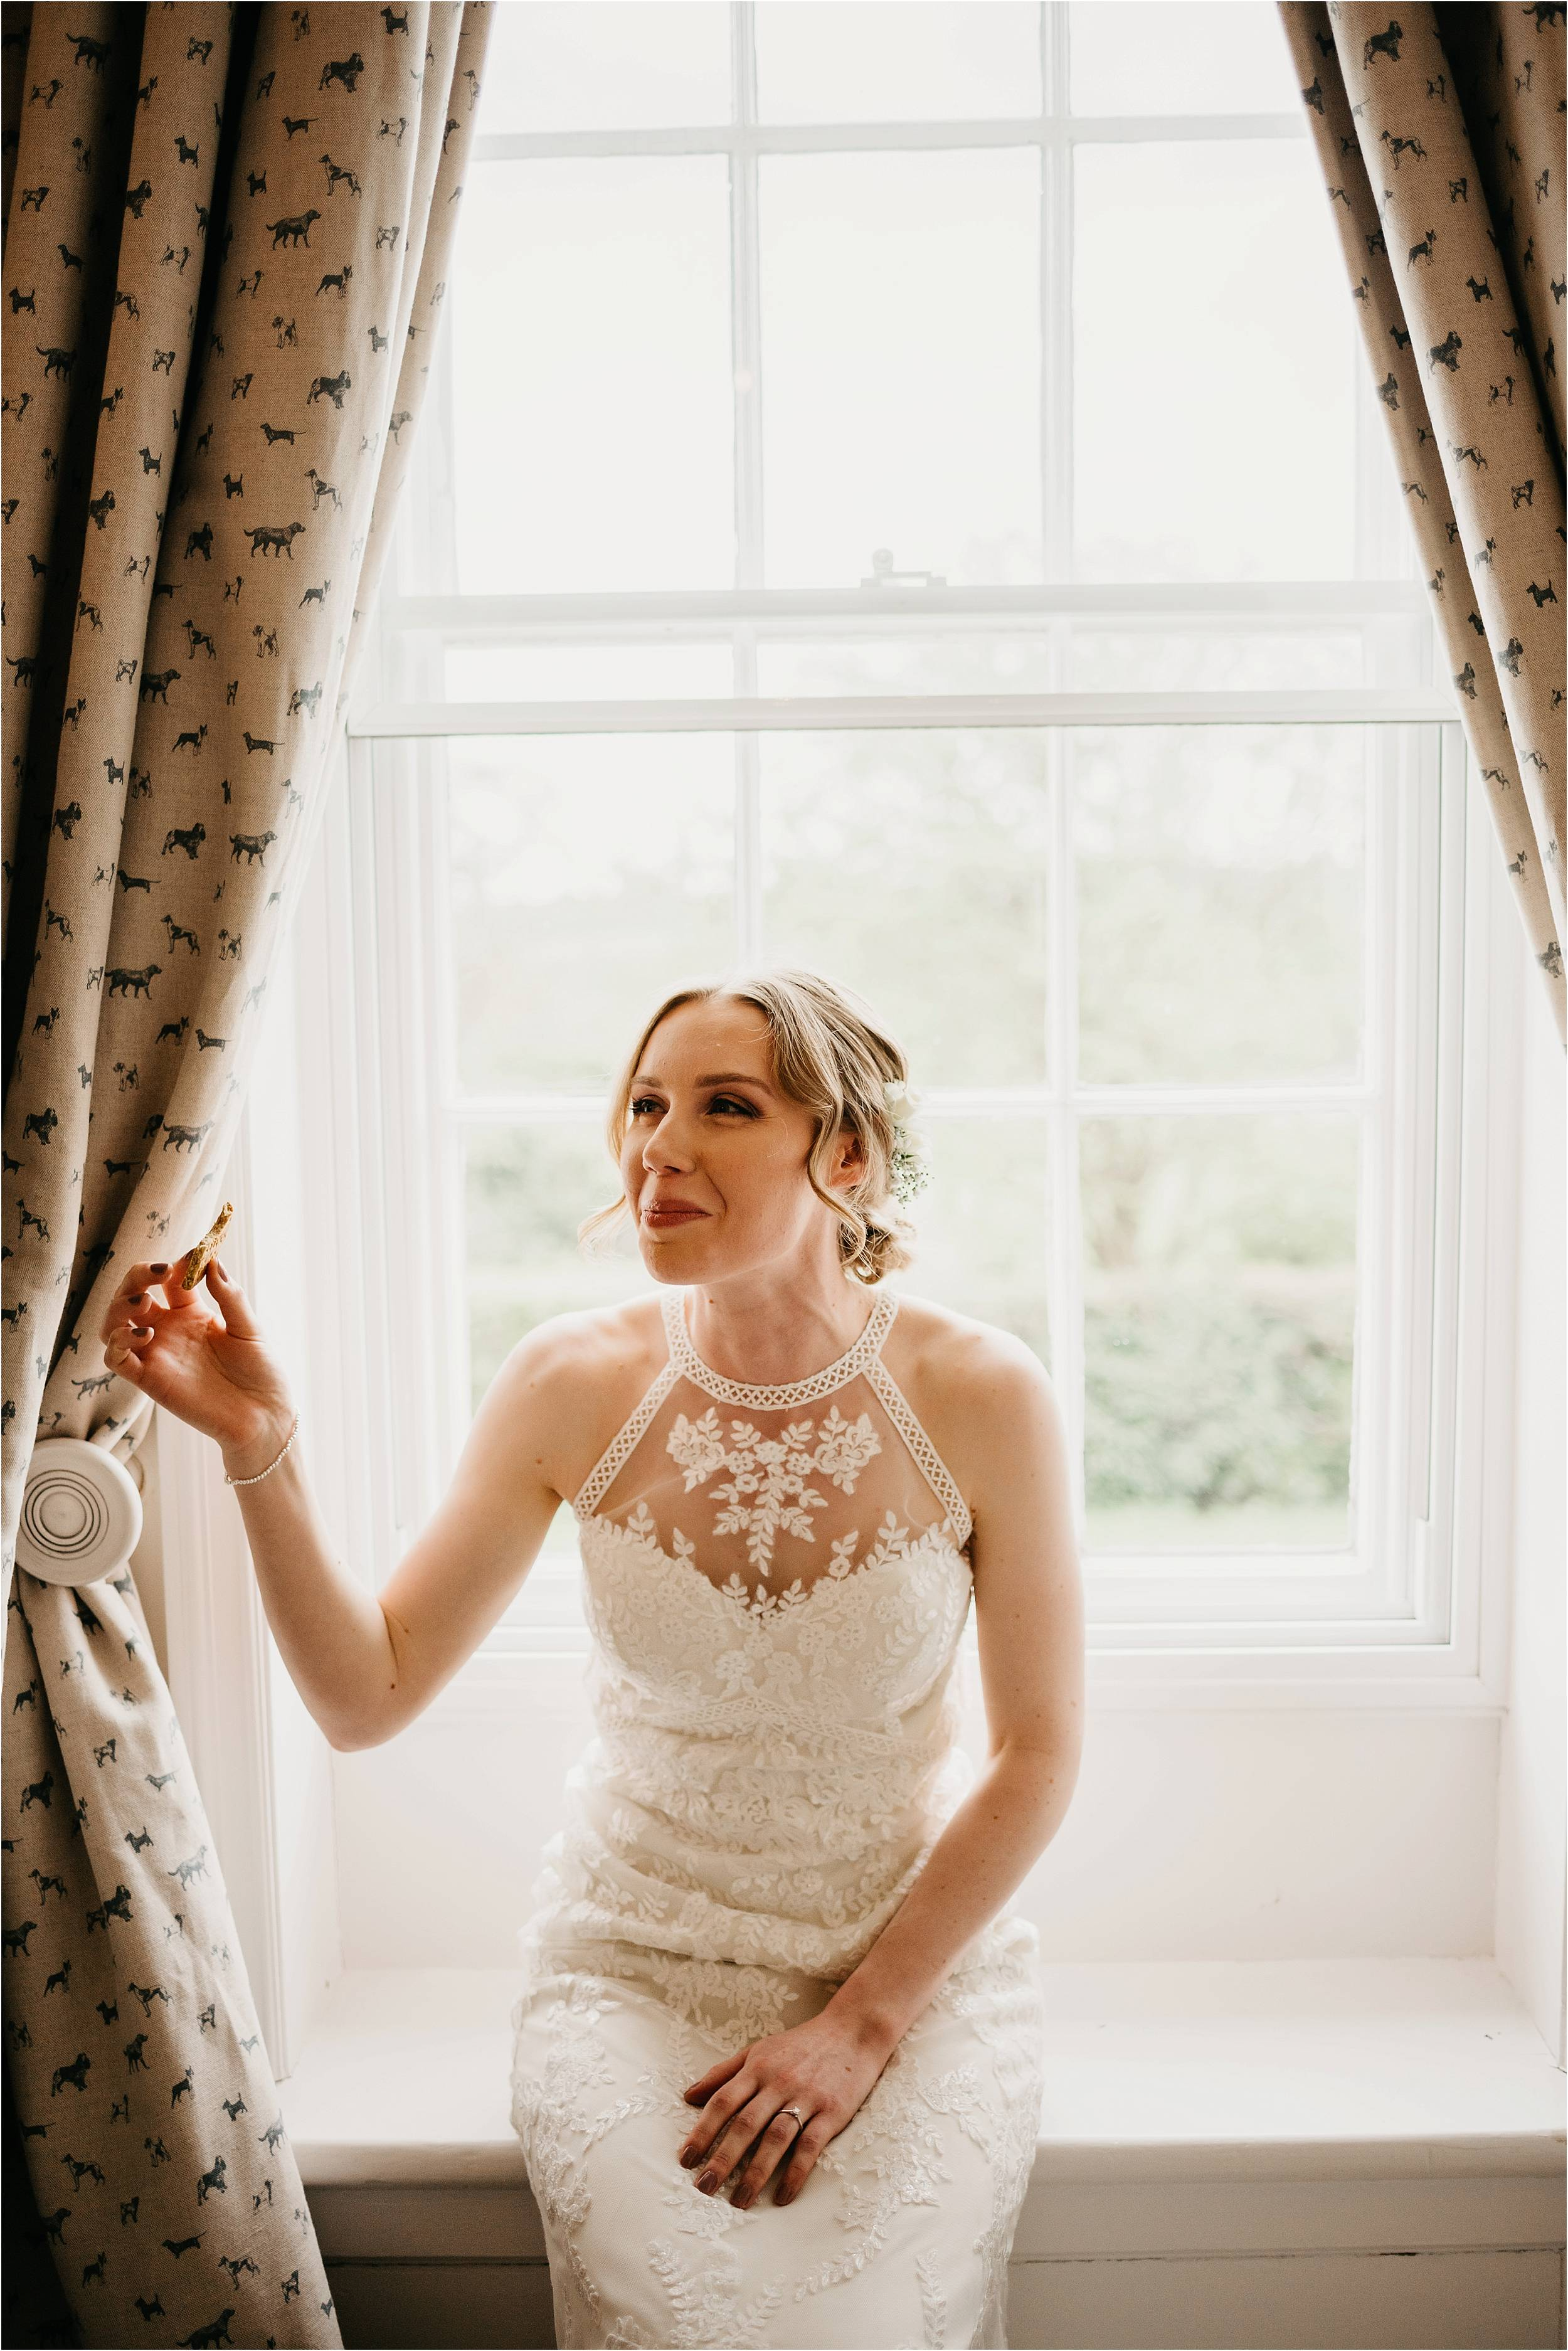 Kedleston Country House Wedding Photography_0039.jpg